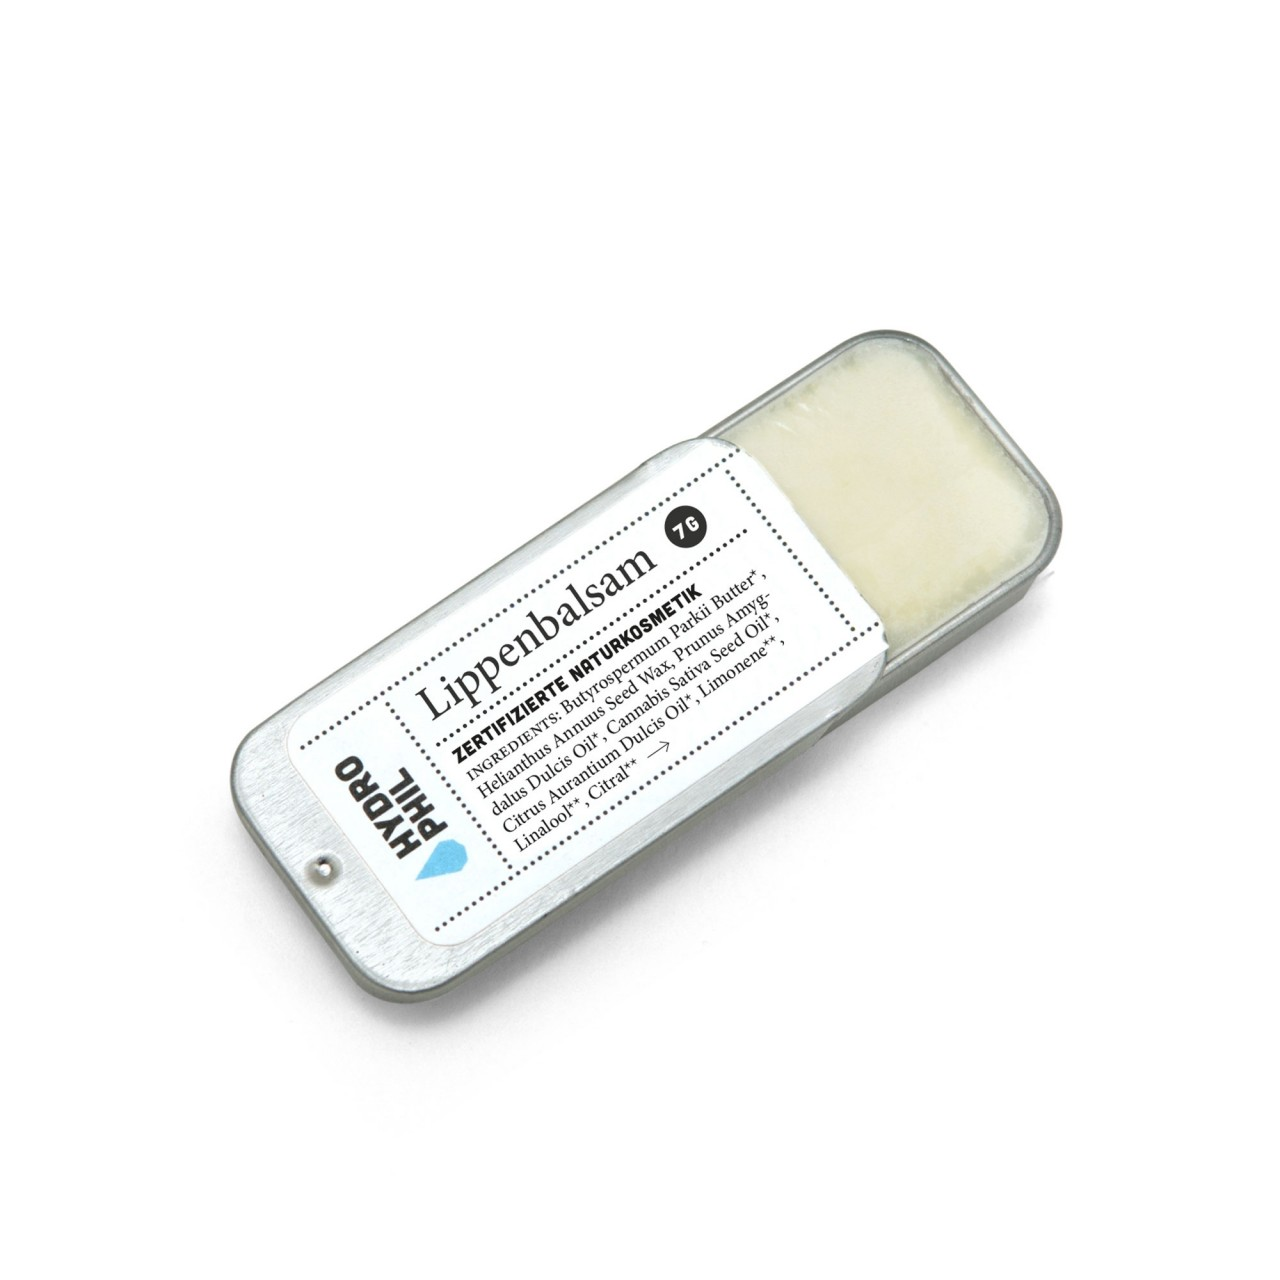 HYDROPHIL Lippenbalsam 1